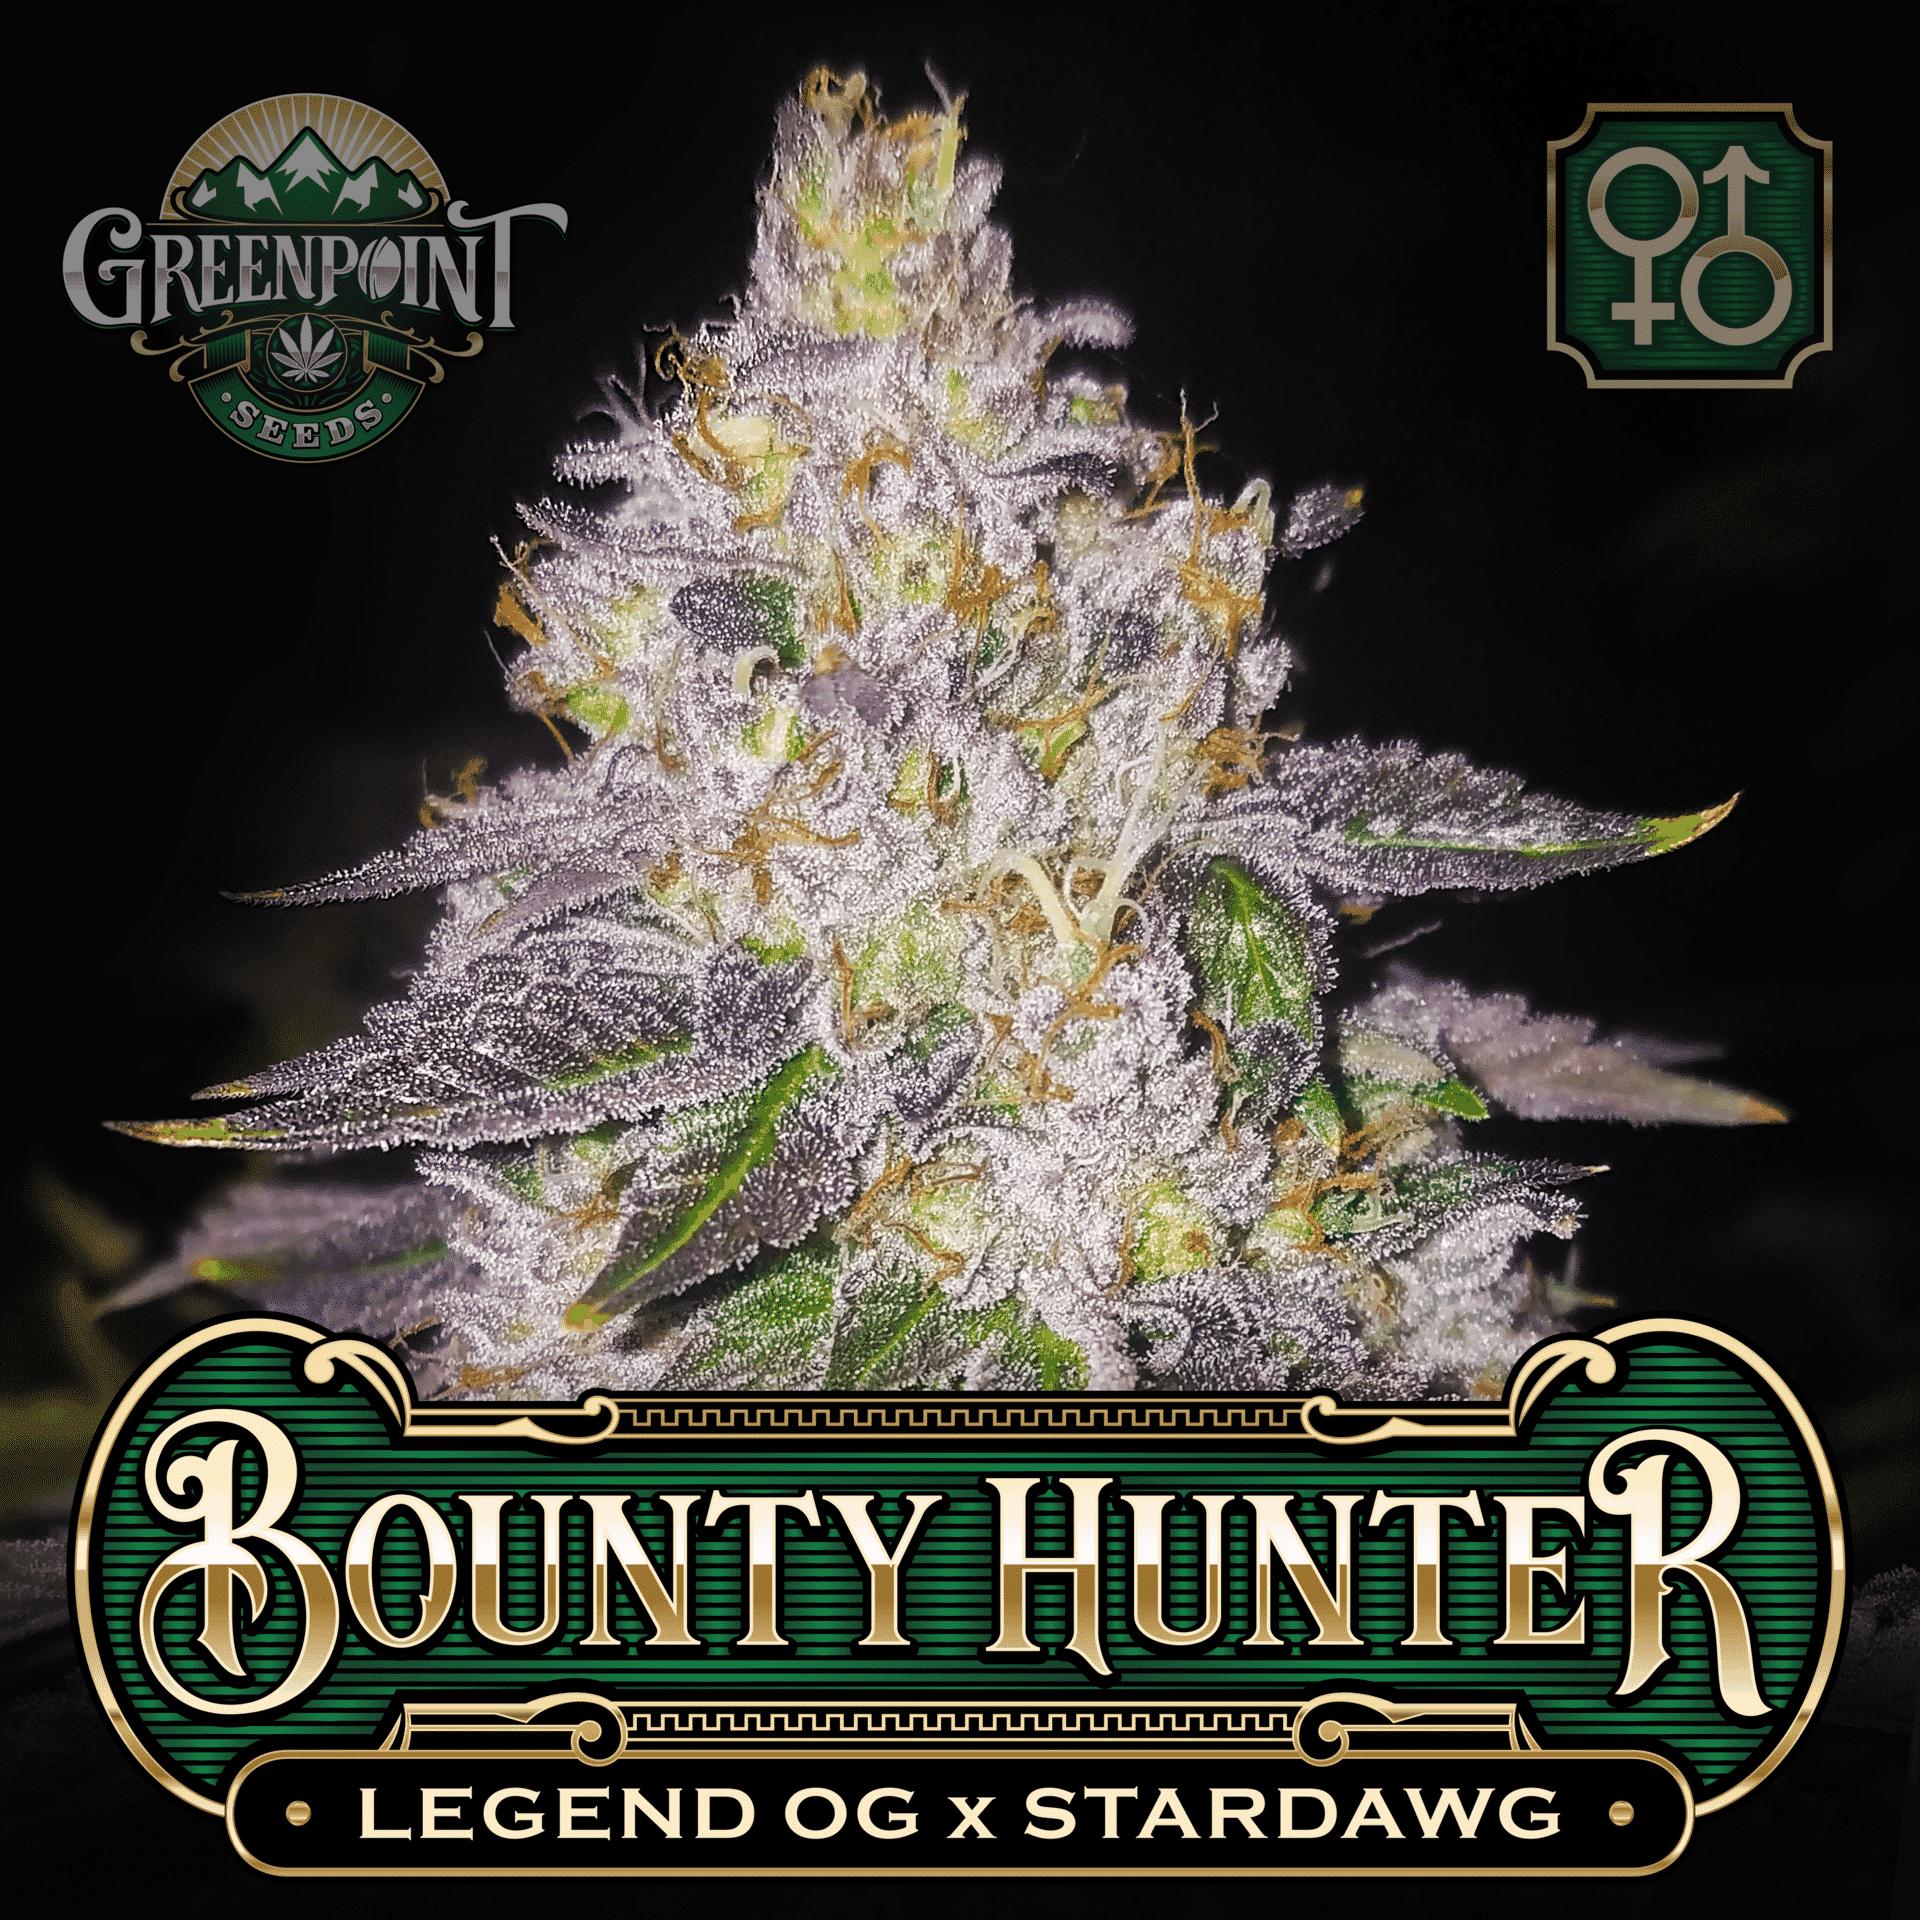 Bounty Hunter Seeds - Legend OG x Stardawg Strain   Greenpoint Seeds